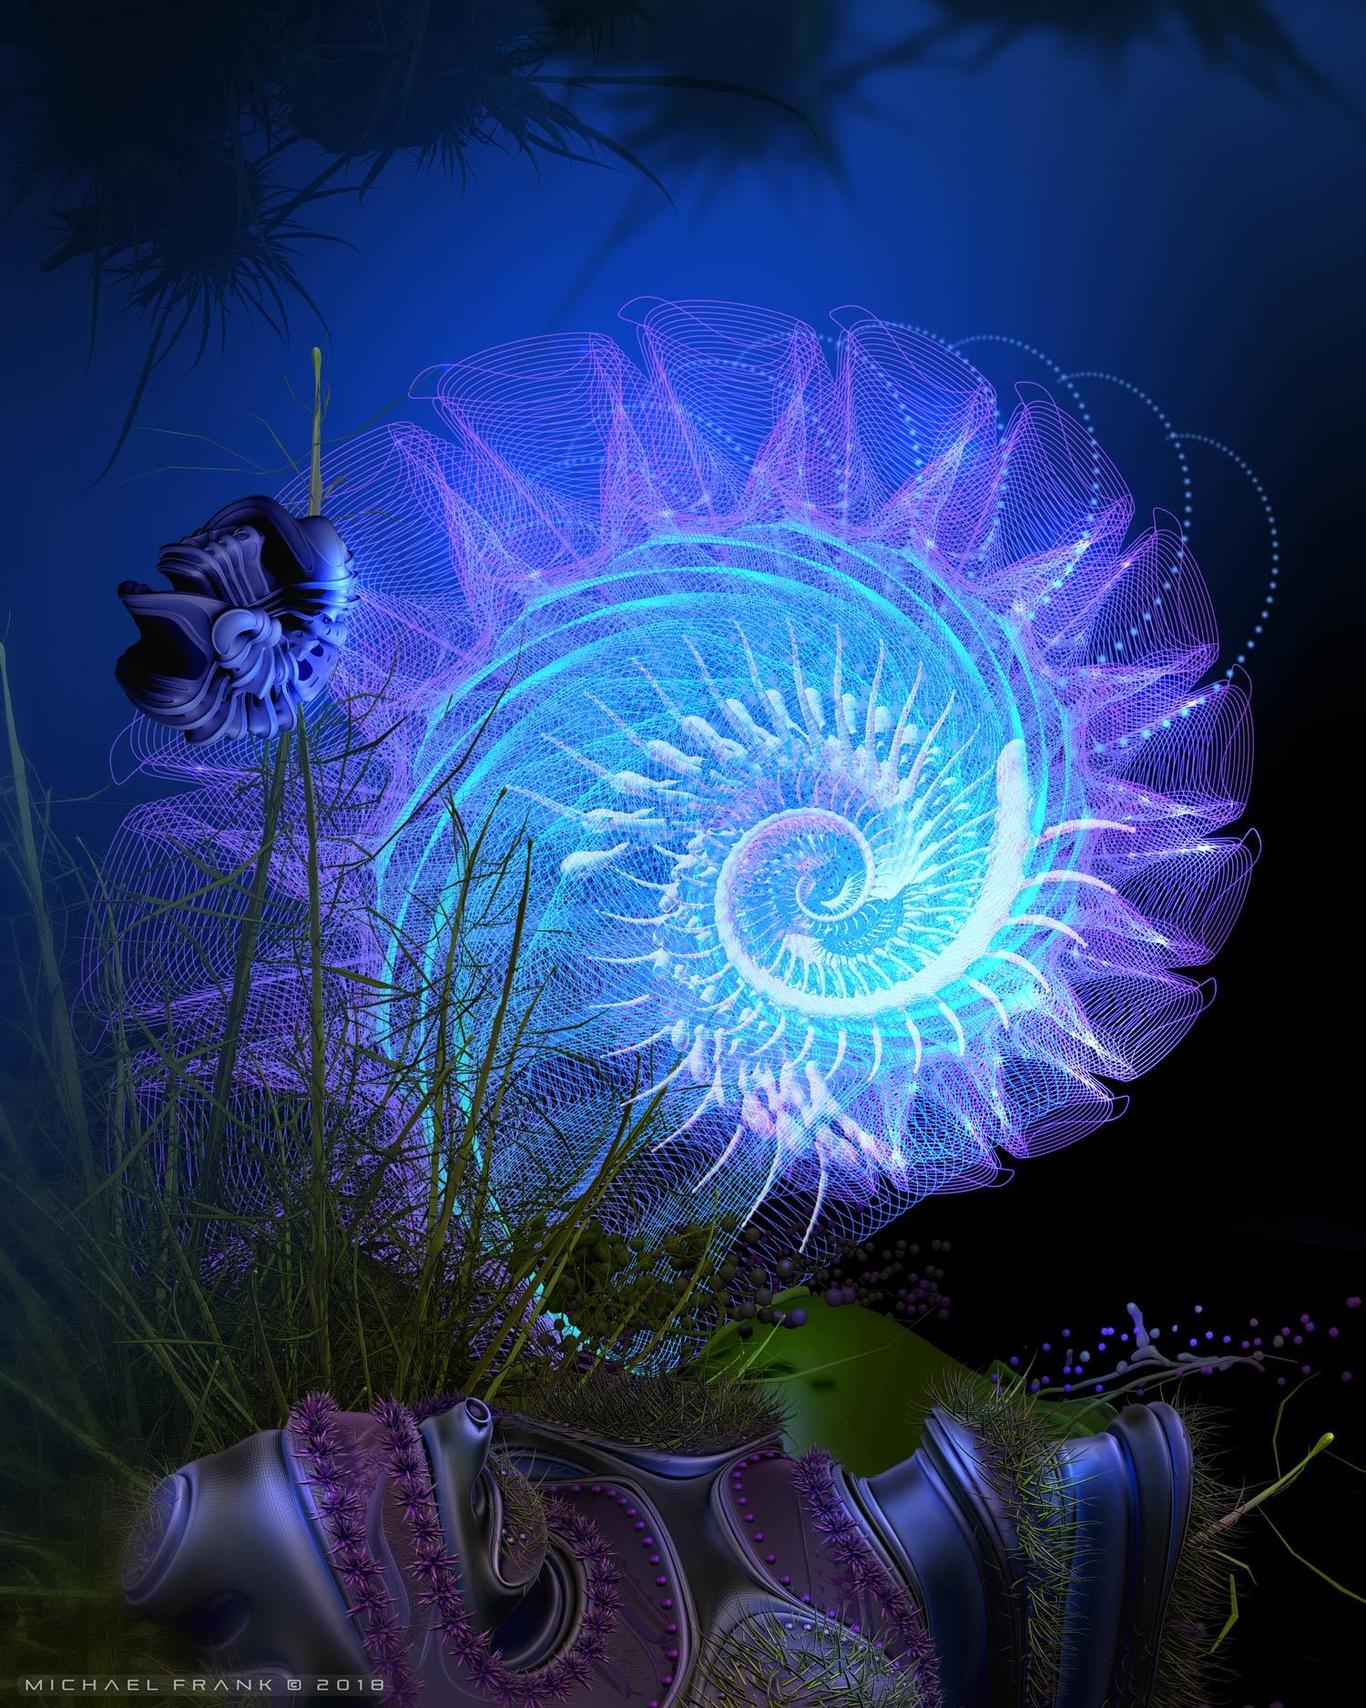 Michaelfrank600 glowing nautilus 1 1598e0e0 ud7c